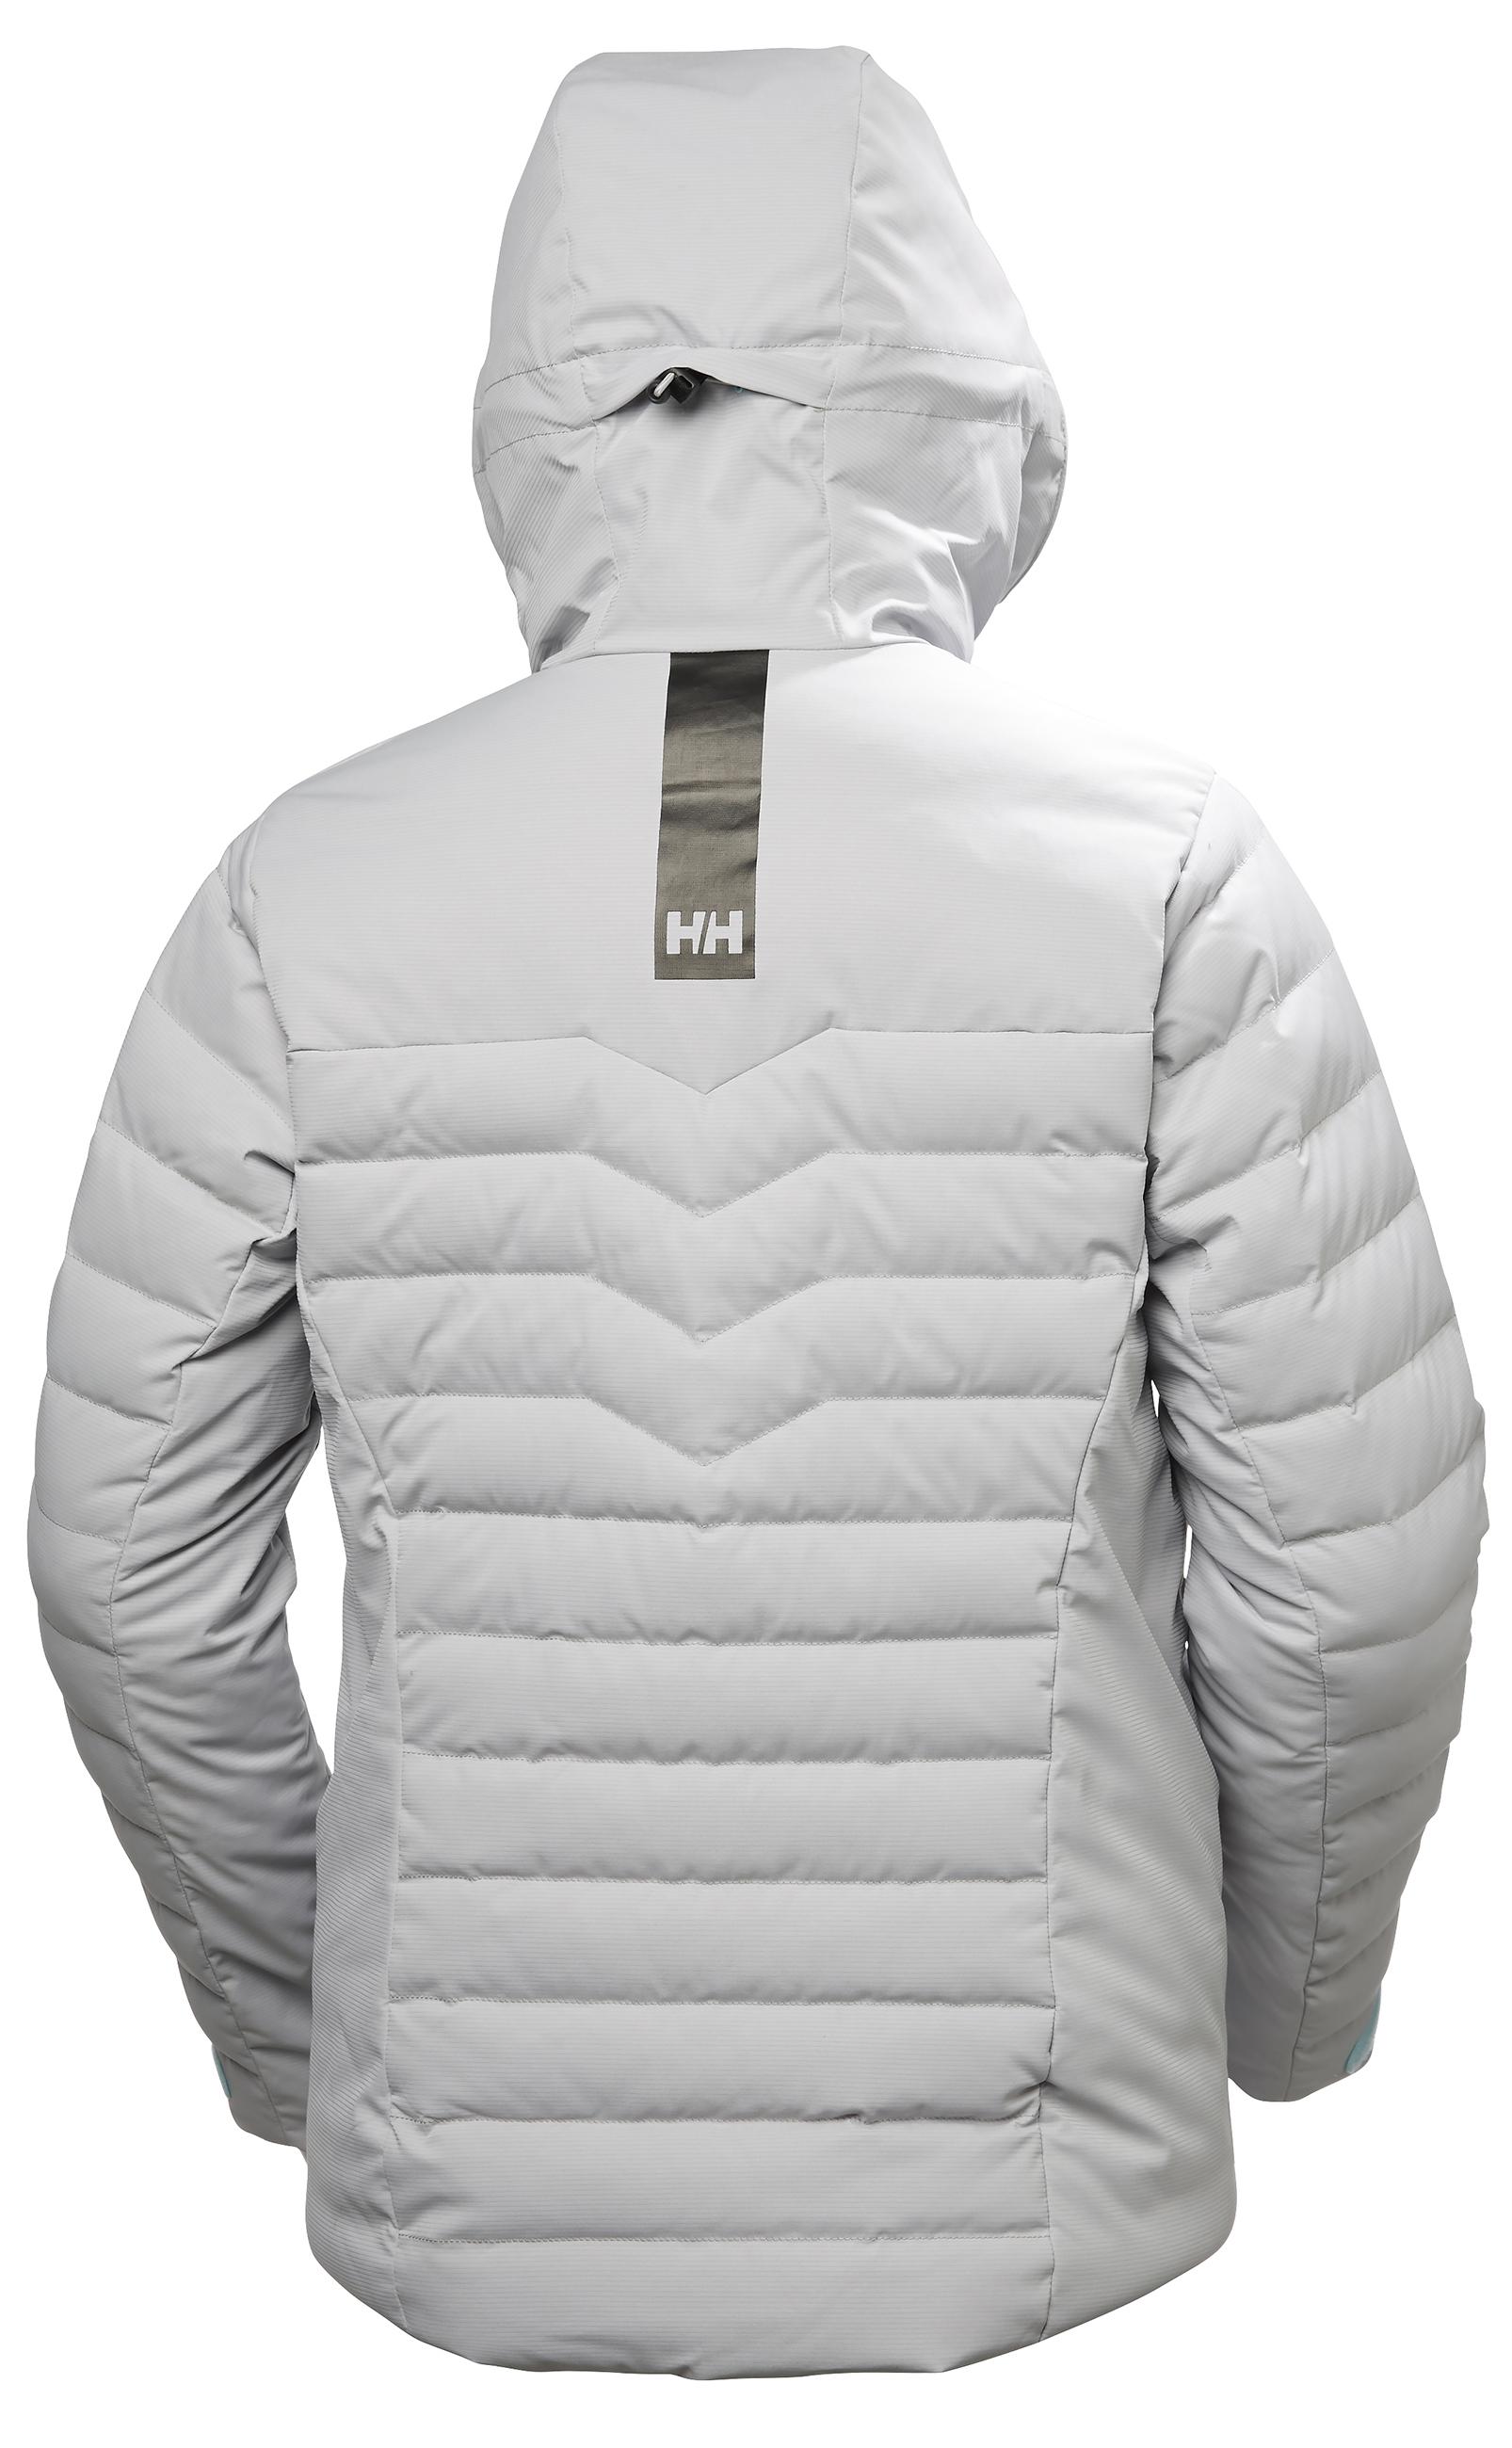 301b932f53 Helly Hansen Limelight Jacket - Women s